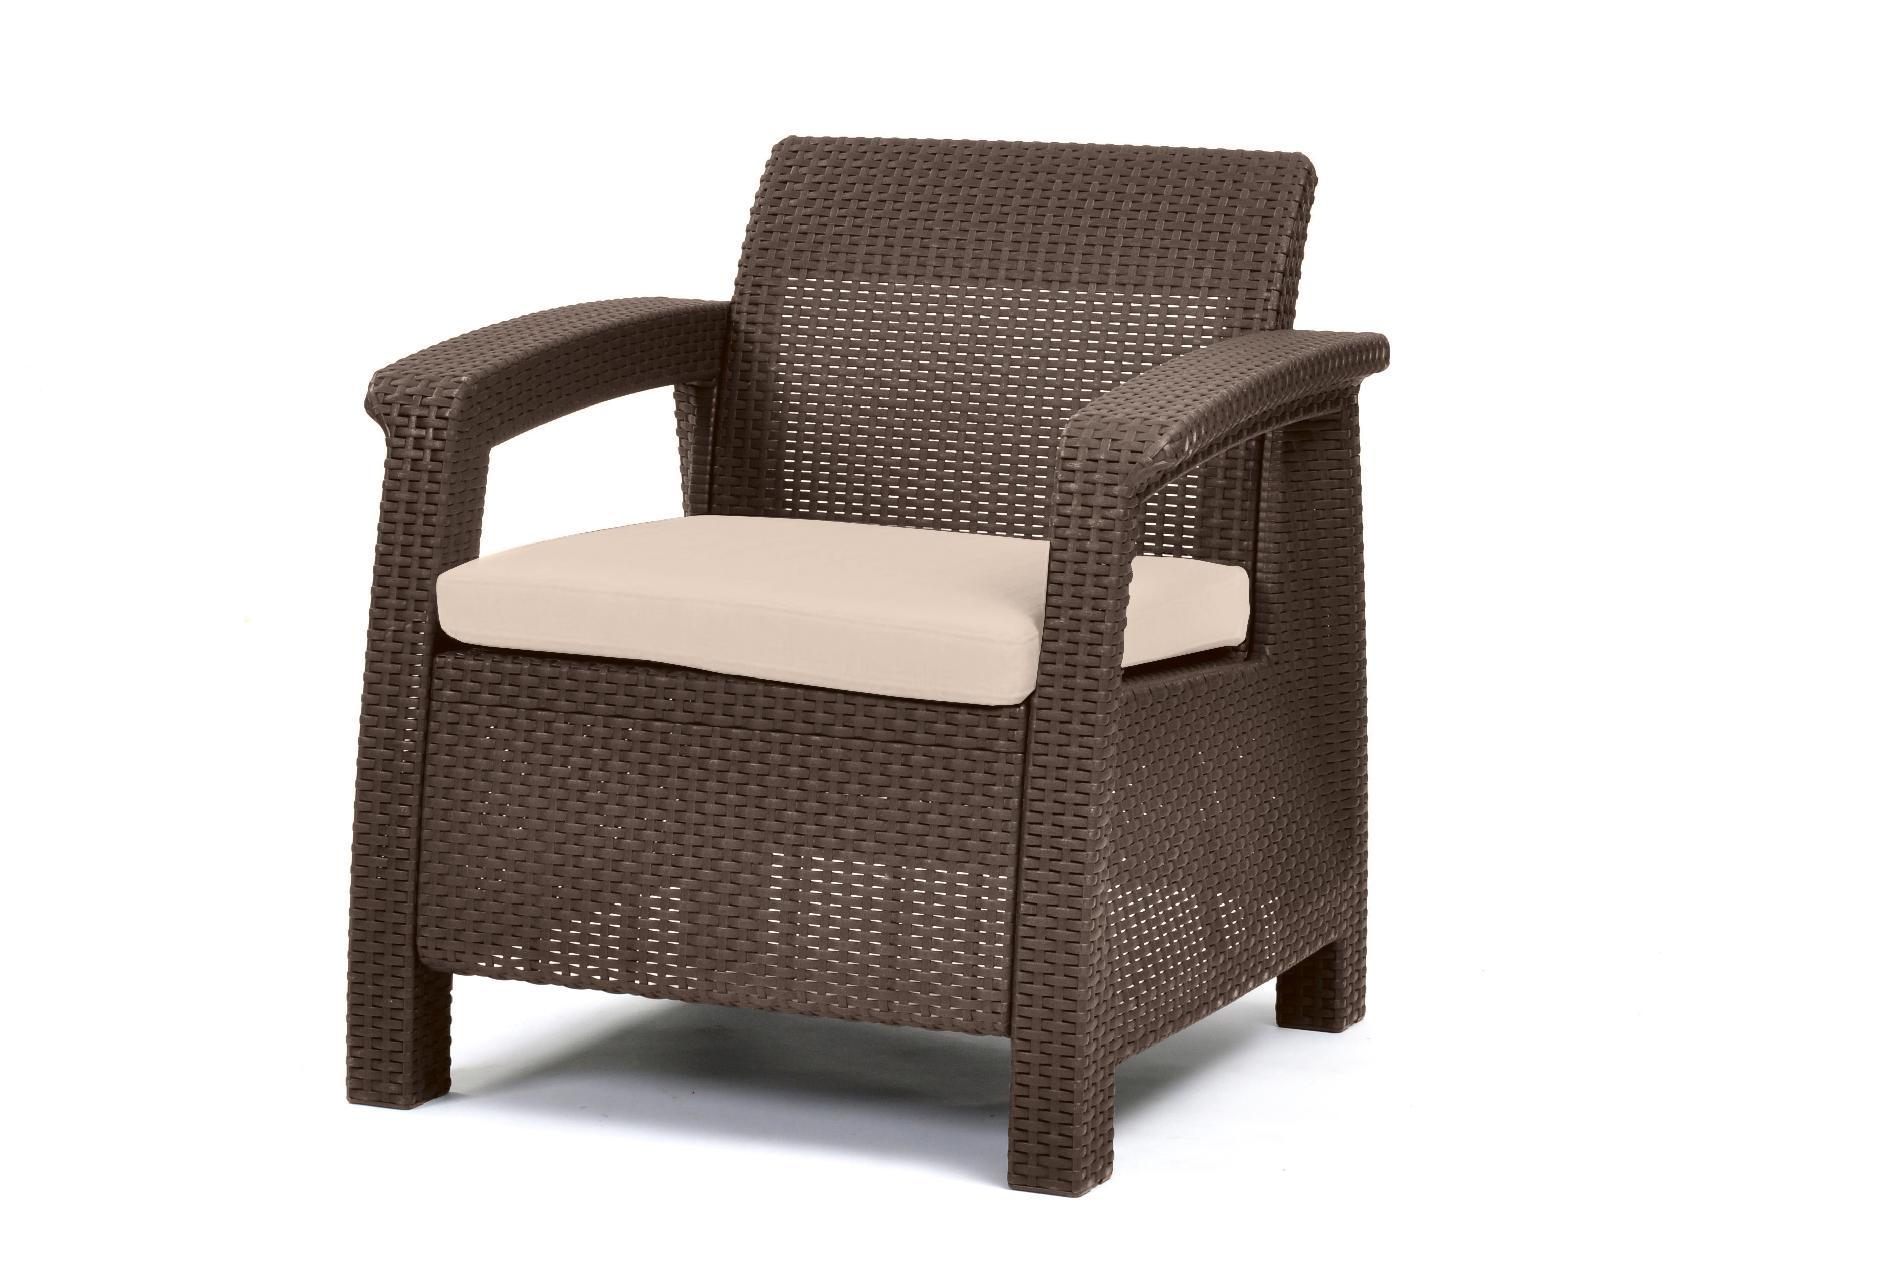 keter high chair plastic wood adirondack chairs ltd upc and barcode upcitemdb